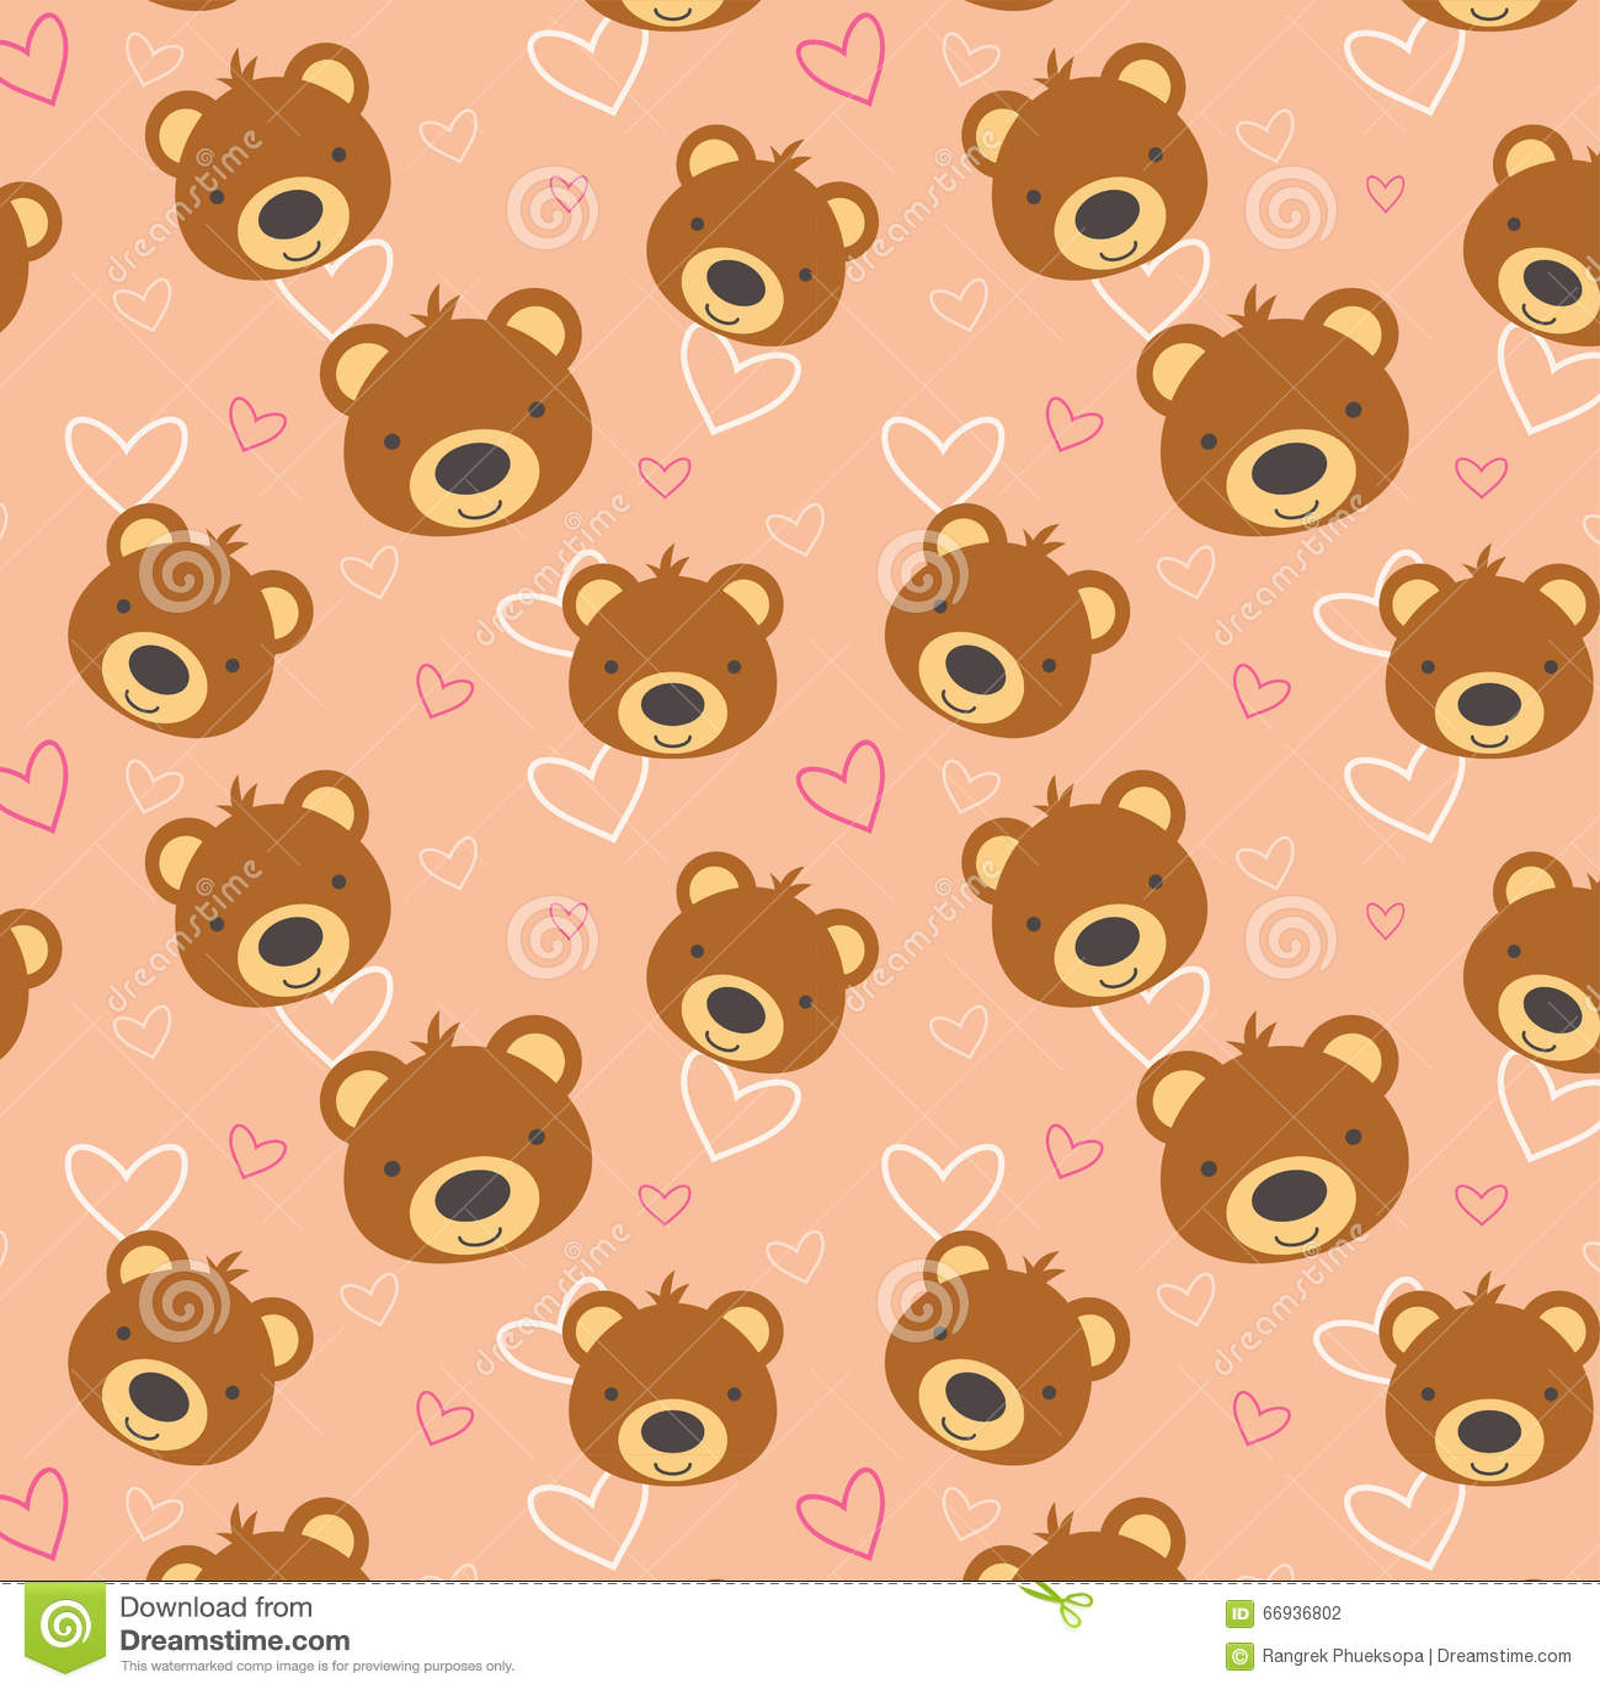 Teddy Bear Pattern Stock Vector - Image: 66936802